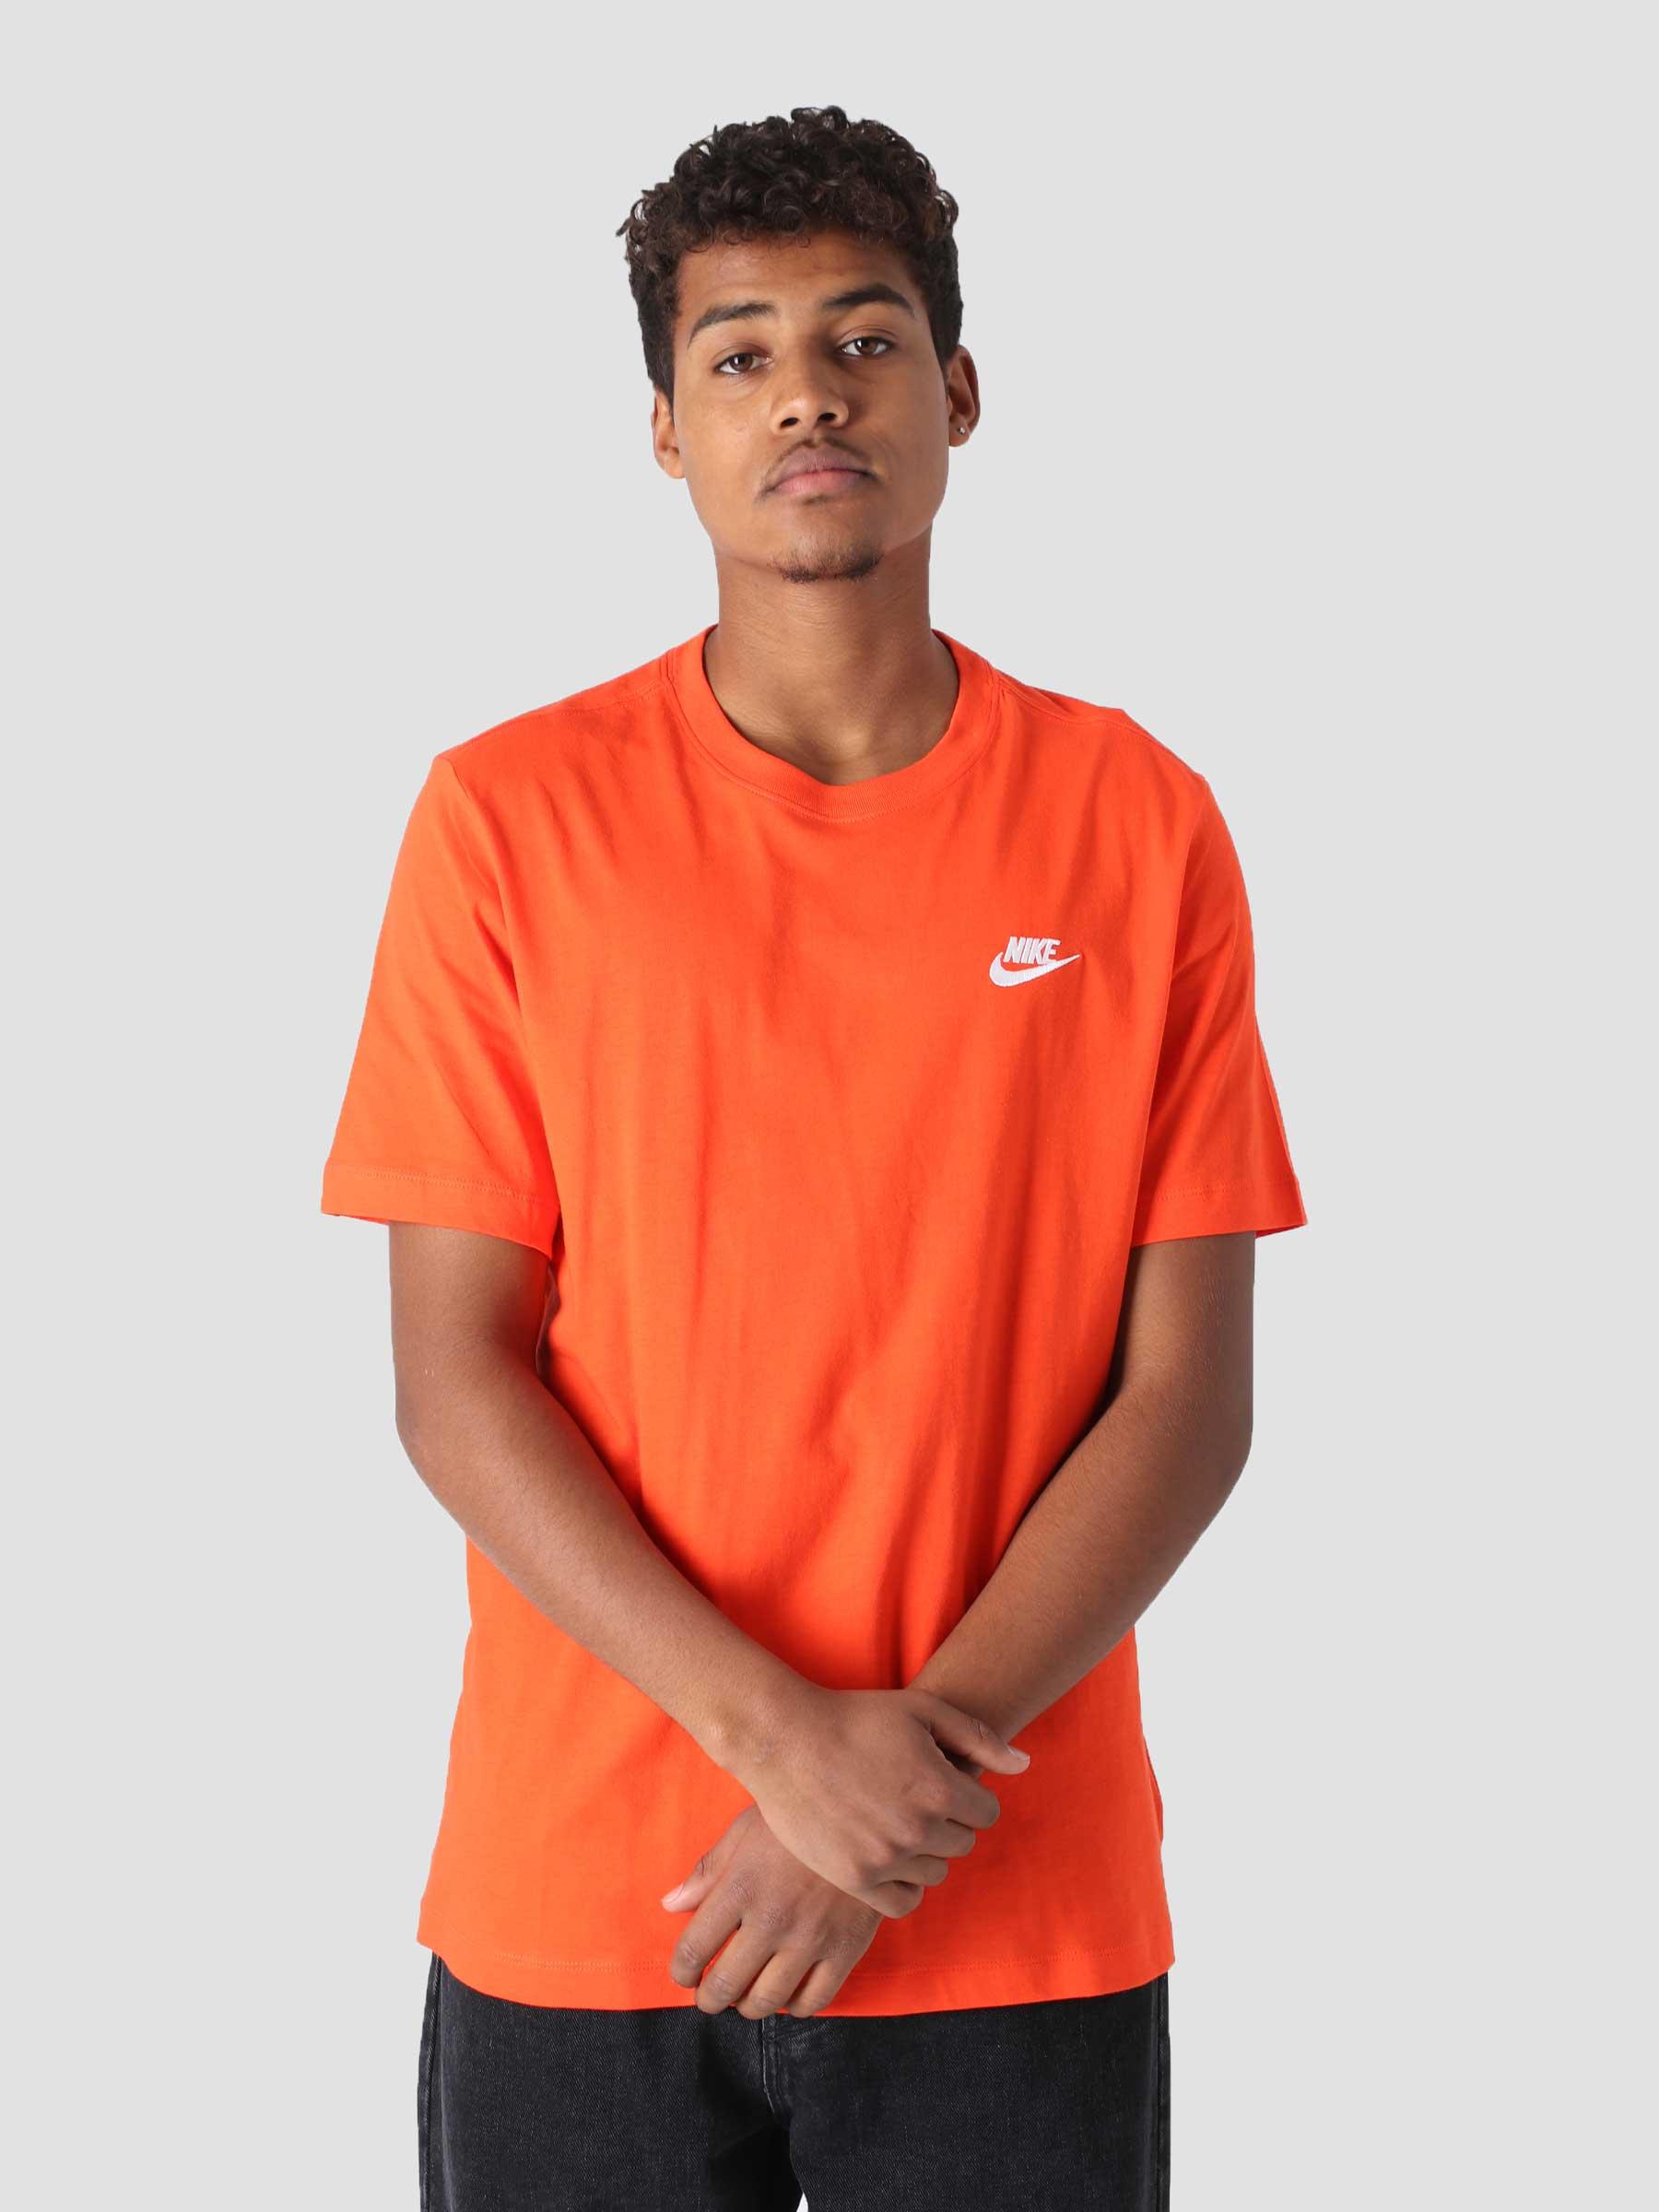 Sportswear T-Shirt Team Orange White Ar4997-891